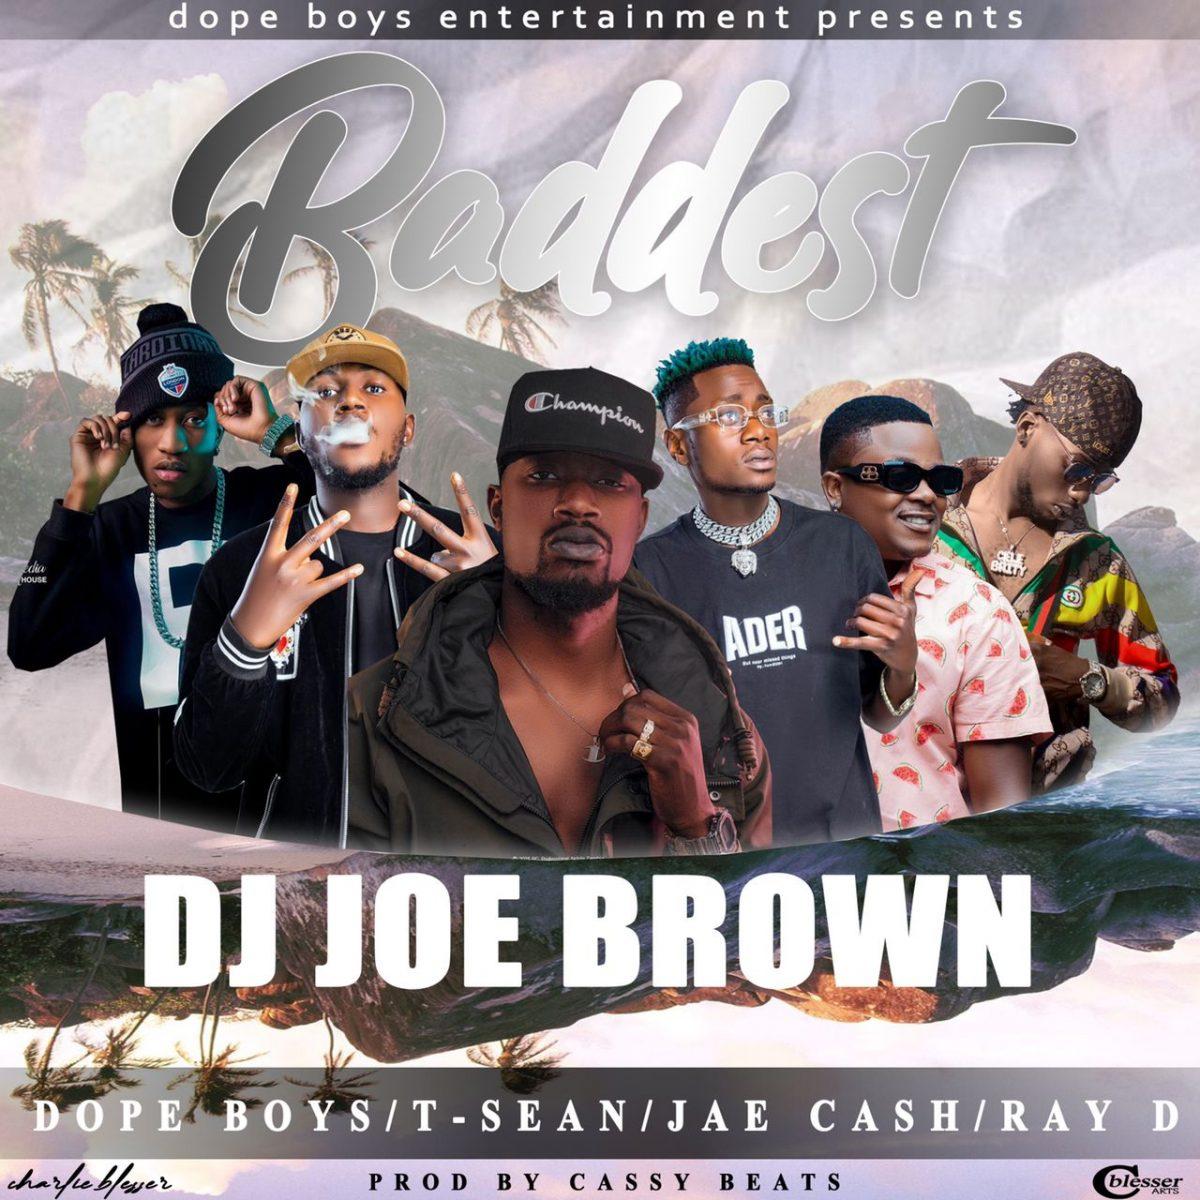 DJ Joe Brown ft. Dope Boys, T-Sean, Jae Cash & Ray Dee - Baddest